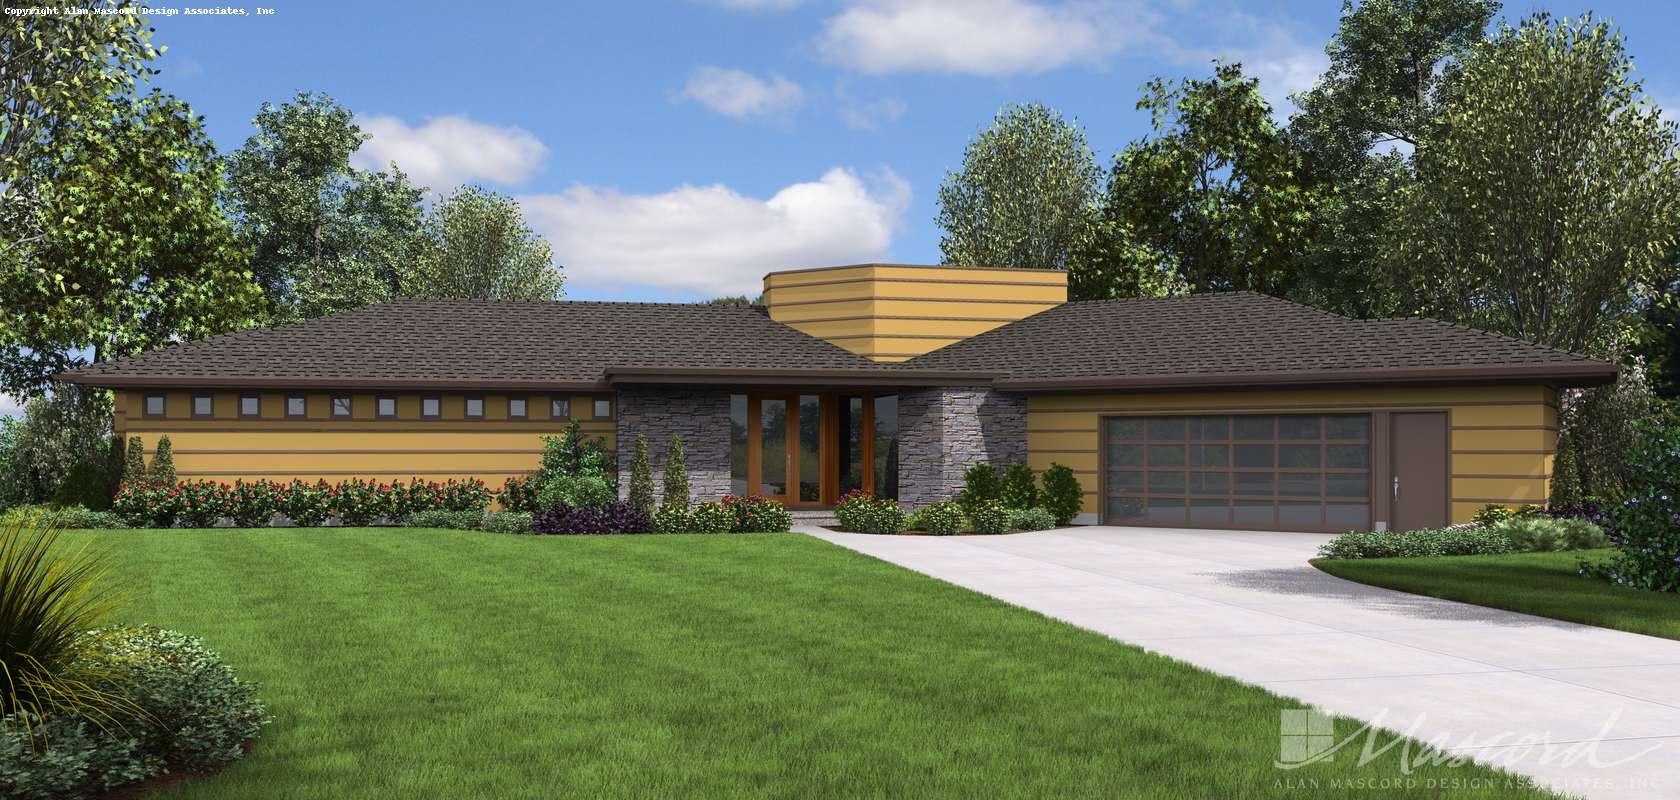 Mascord House Plan 1252: The Cheatham